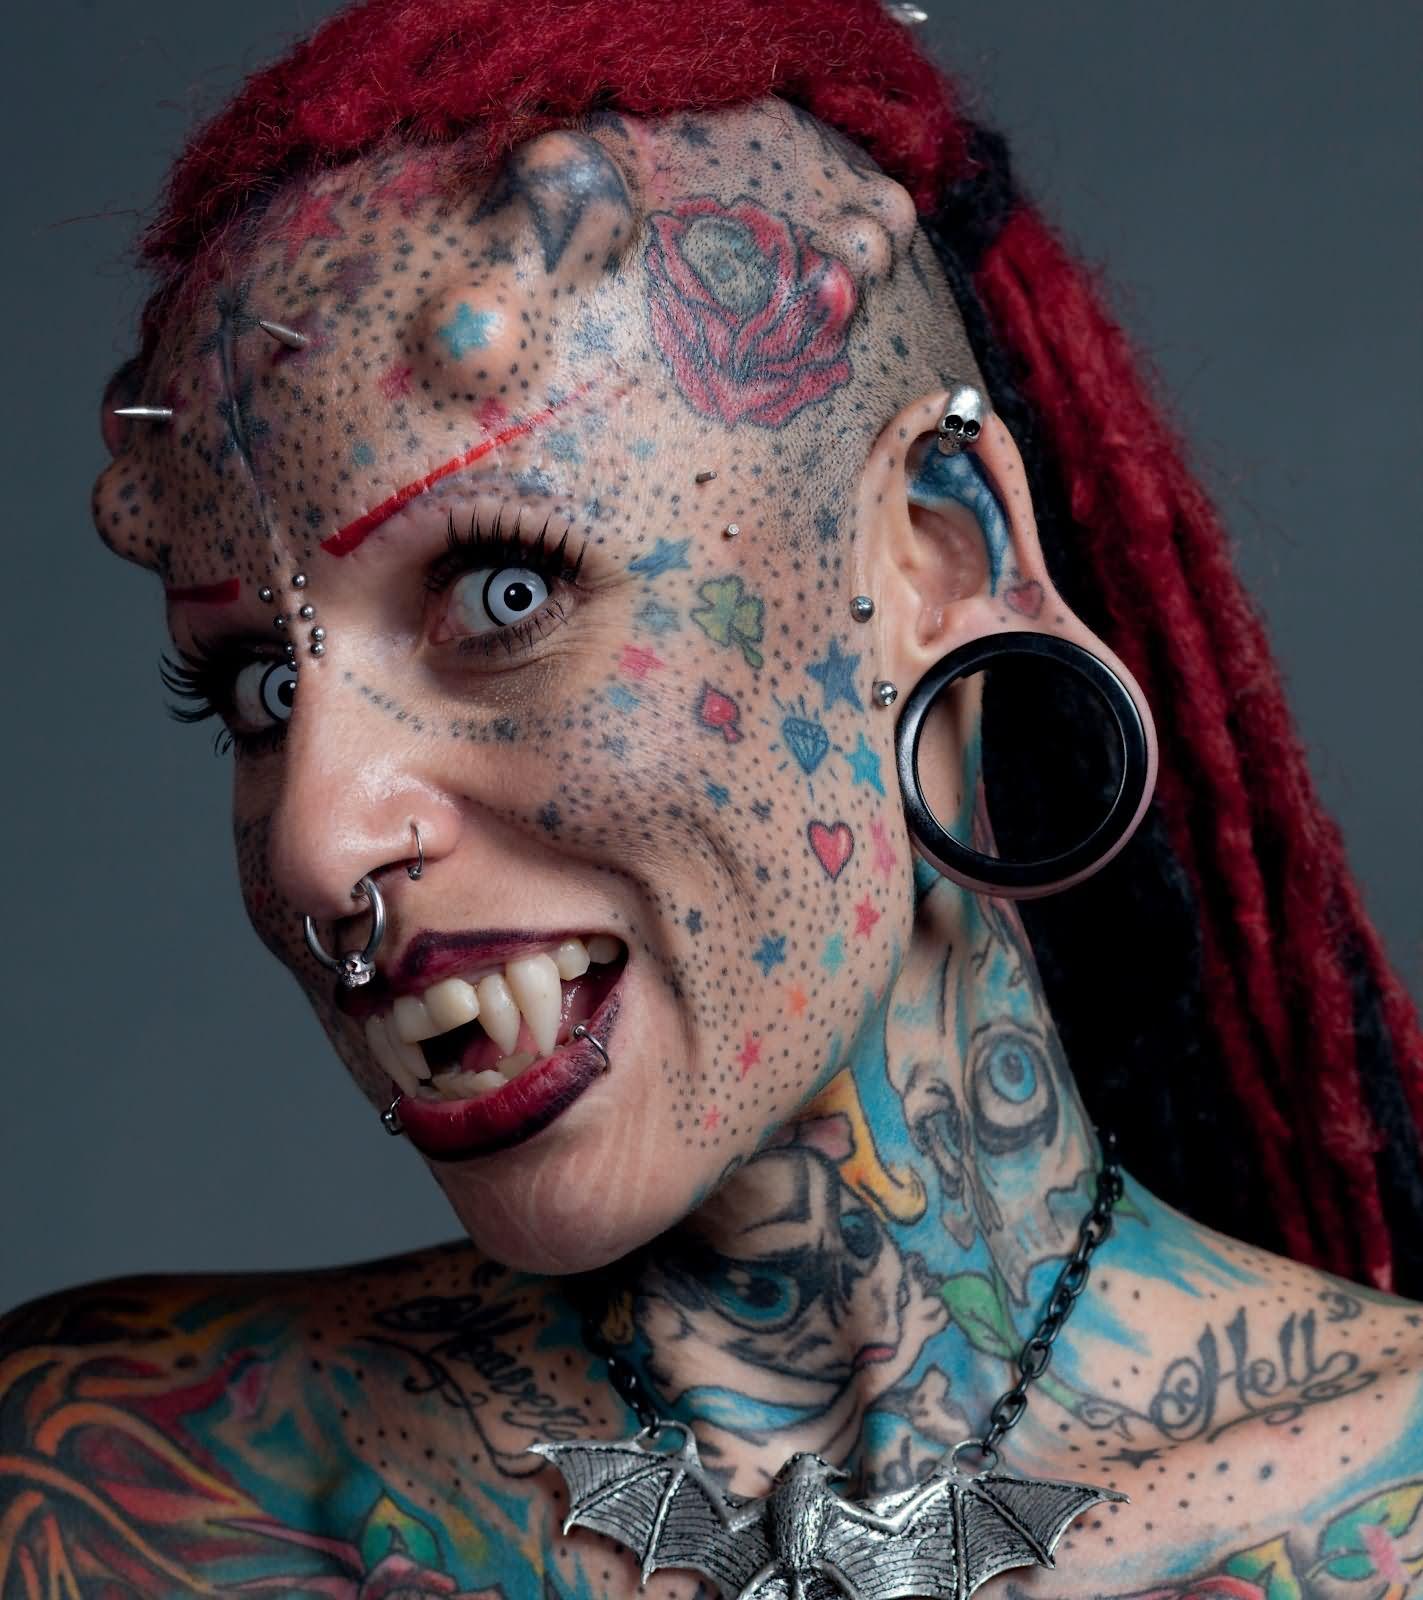 d8bf02b82 Colored Vampire Girl Tattoo